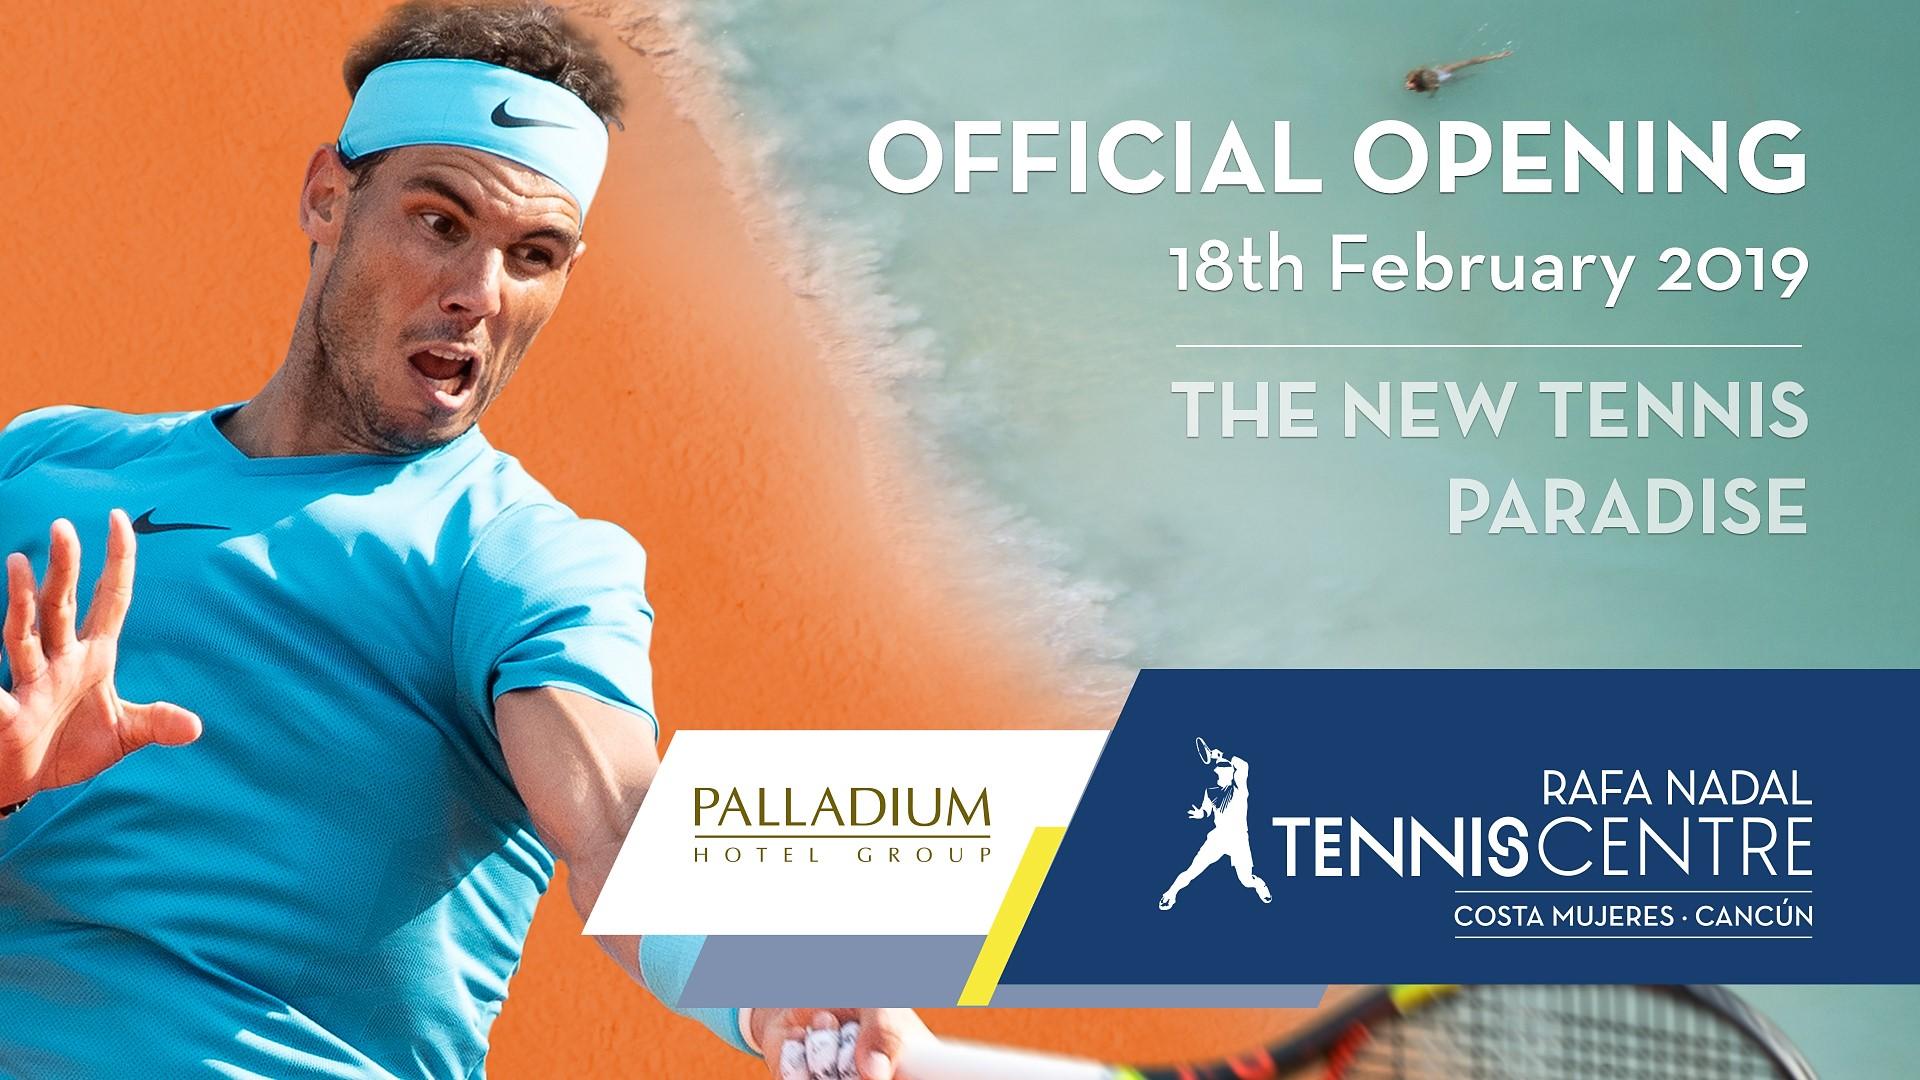 Nadal inaugura en Costa Mujeres el primer Rafa Nadal Tennis Centre